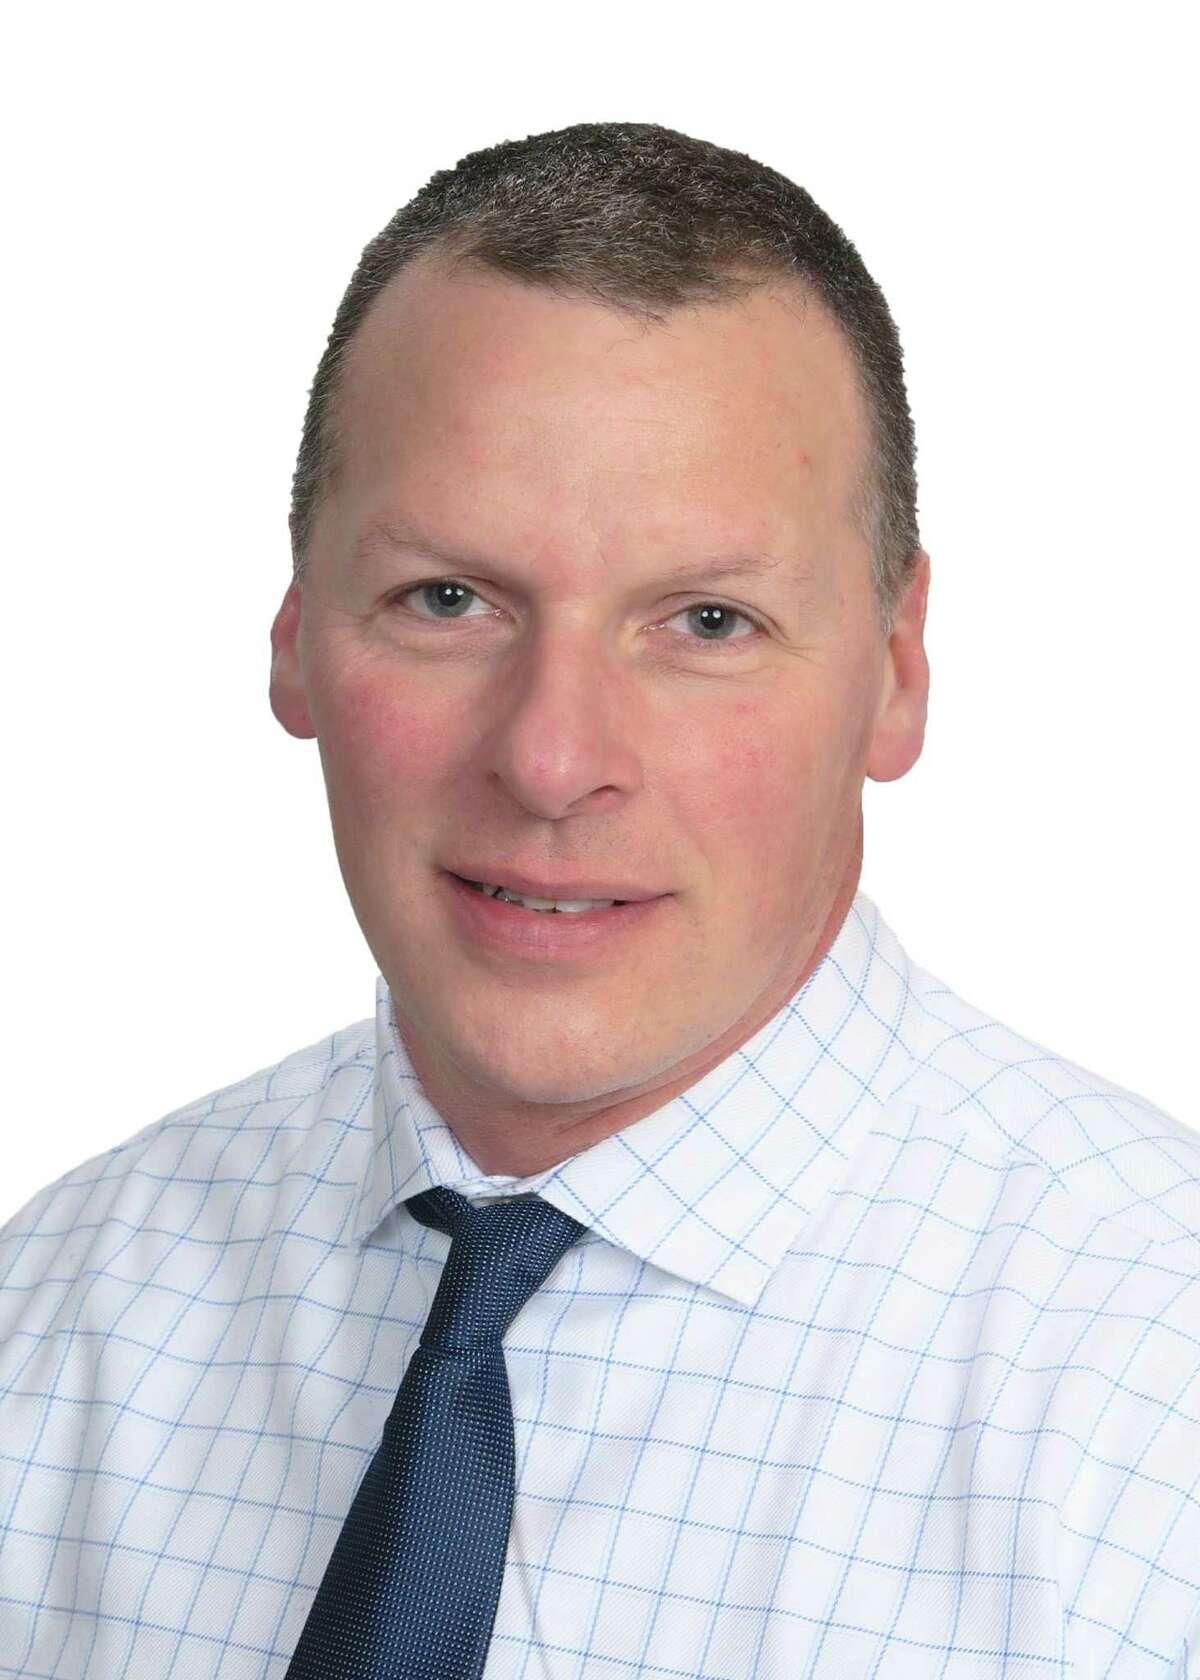 Gerard Armend, Bethel Republican Board of Assessment Appeals candidate